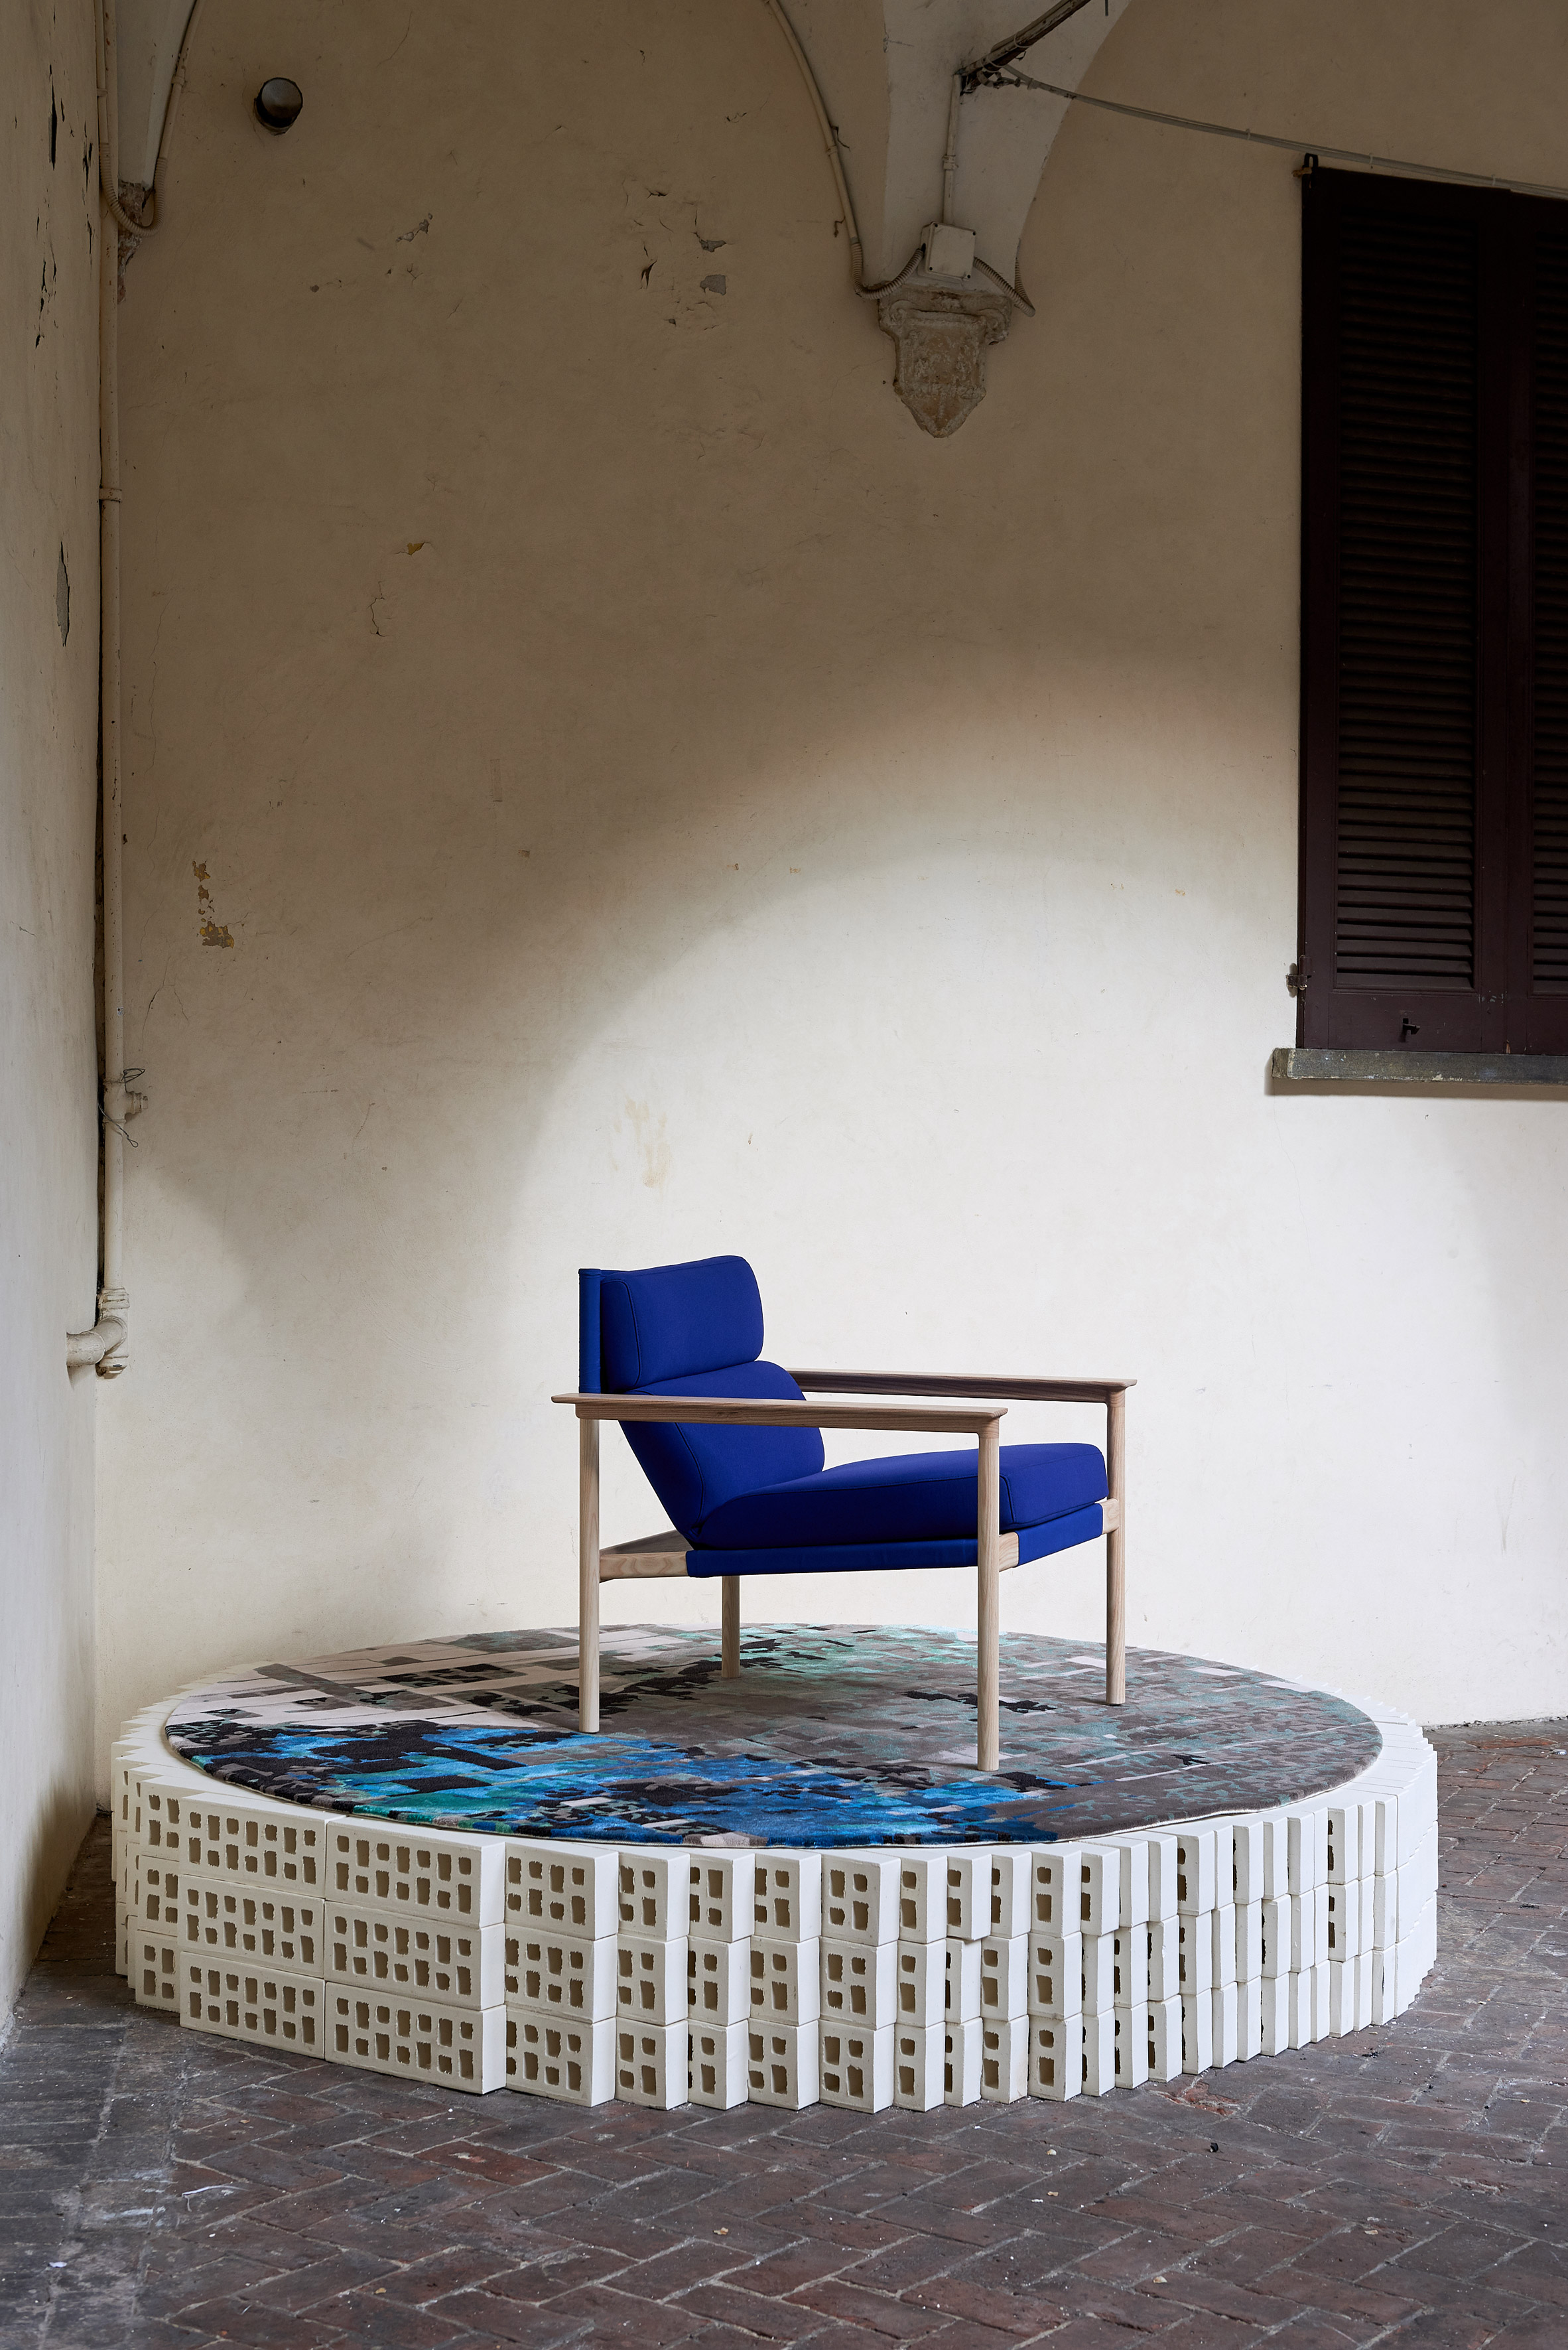 milan-local-design-australian-designers-lighting-furniture_dezeen_2364_col_4.jpg